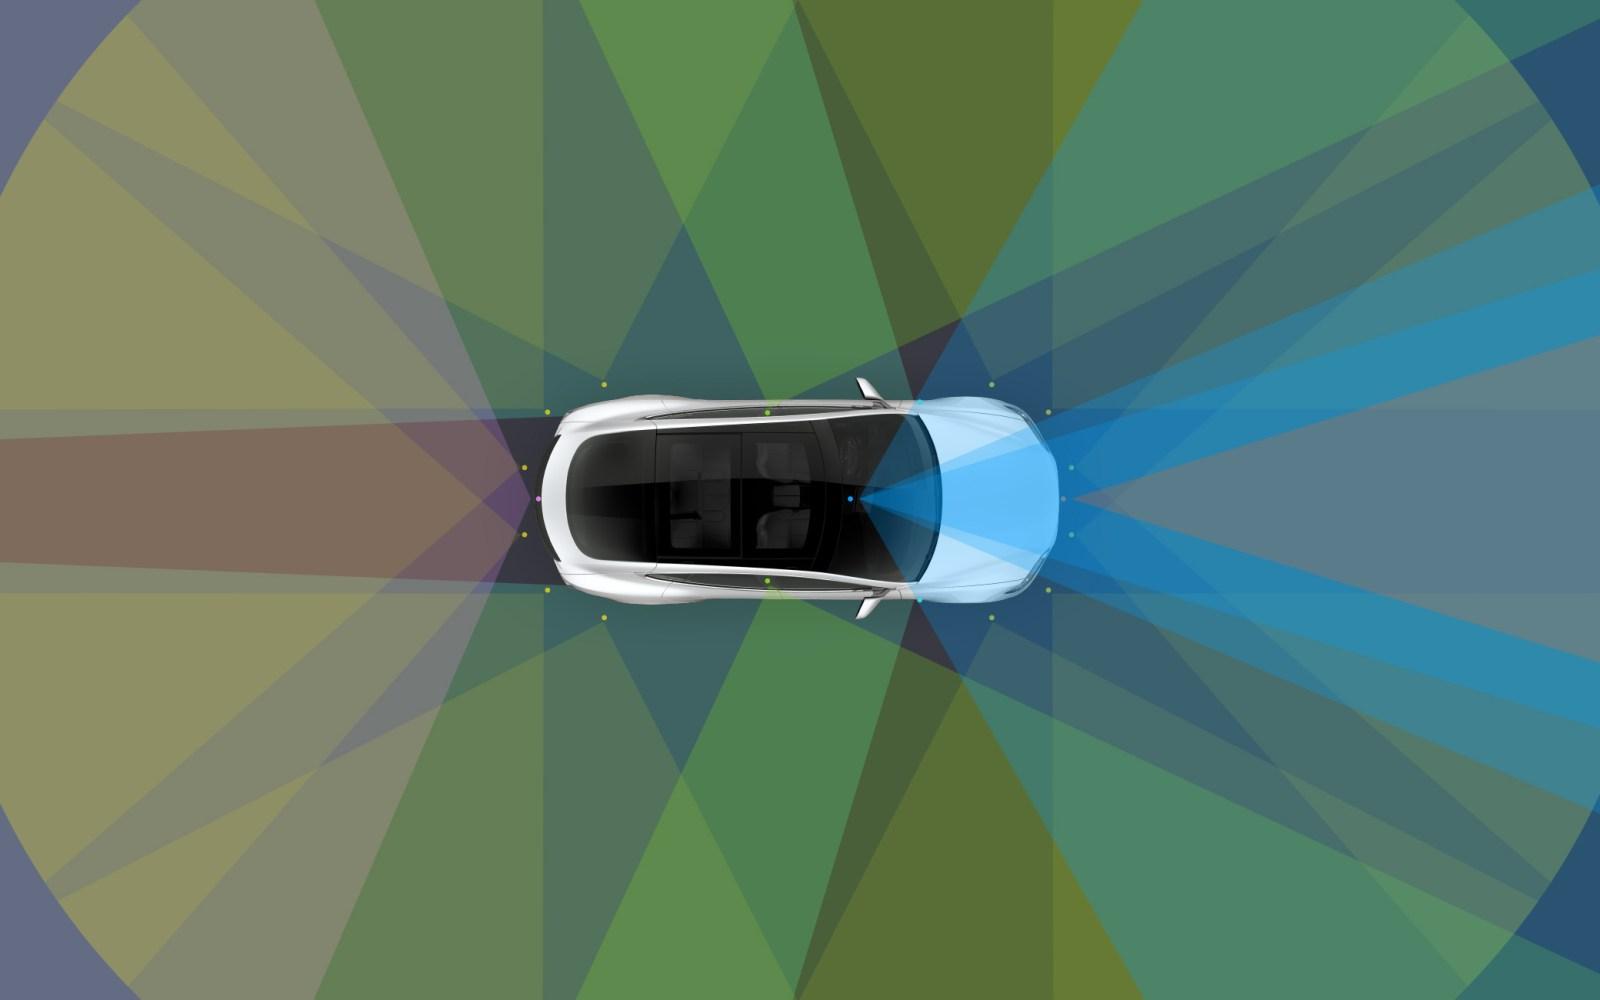 Tesla has now 1.3 billion miles of Autopilot data going into its new self-driving program